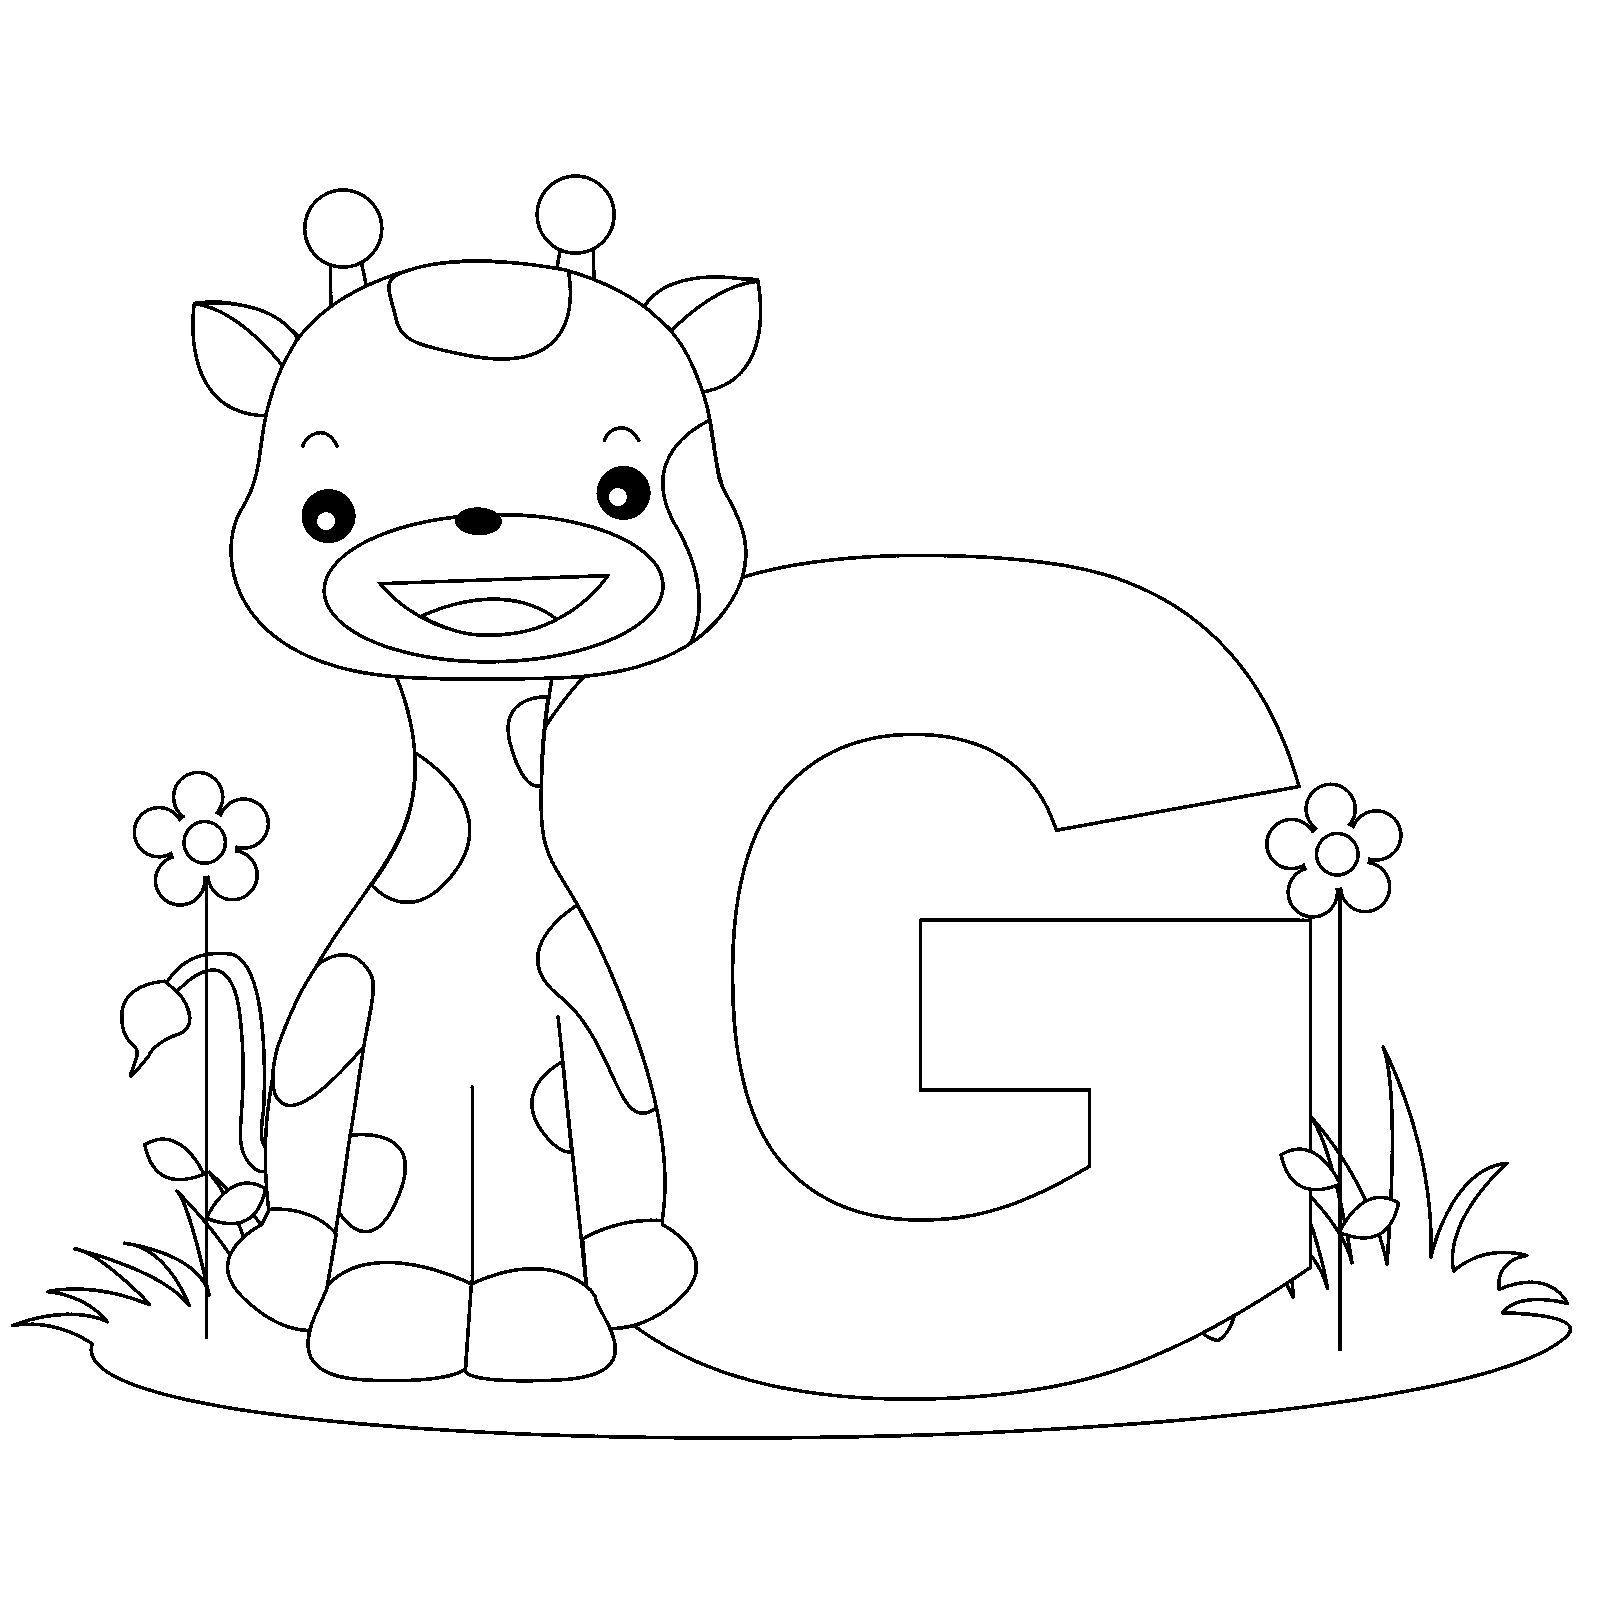 1600x1600 Abc Farm Animal Coloring Pages Letter L Coloring Pages